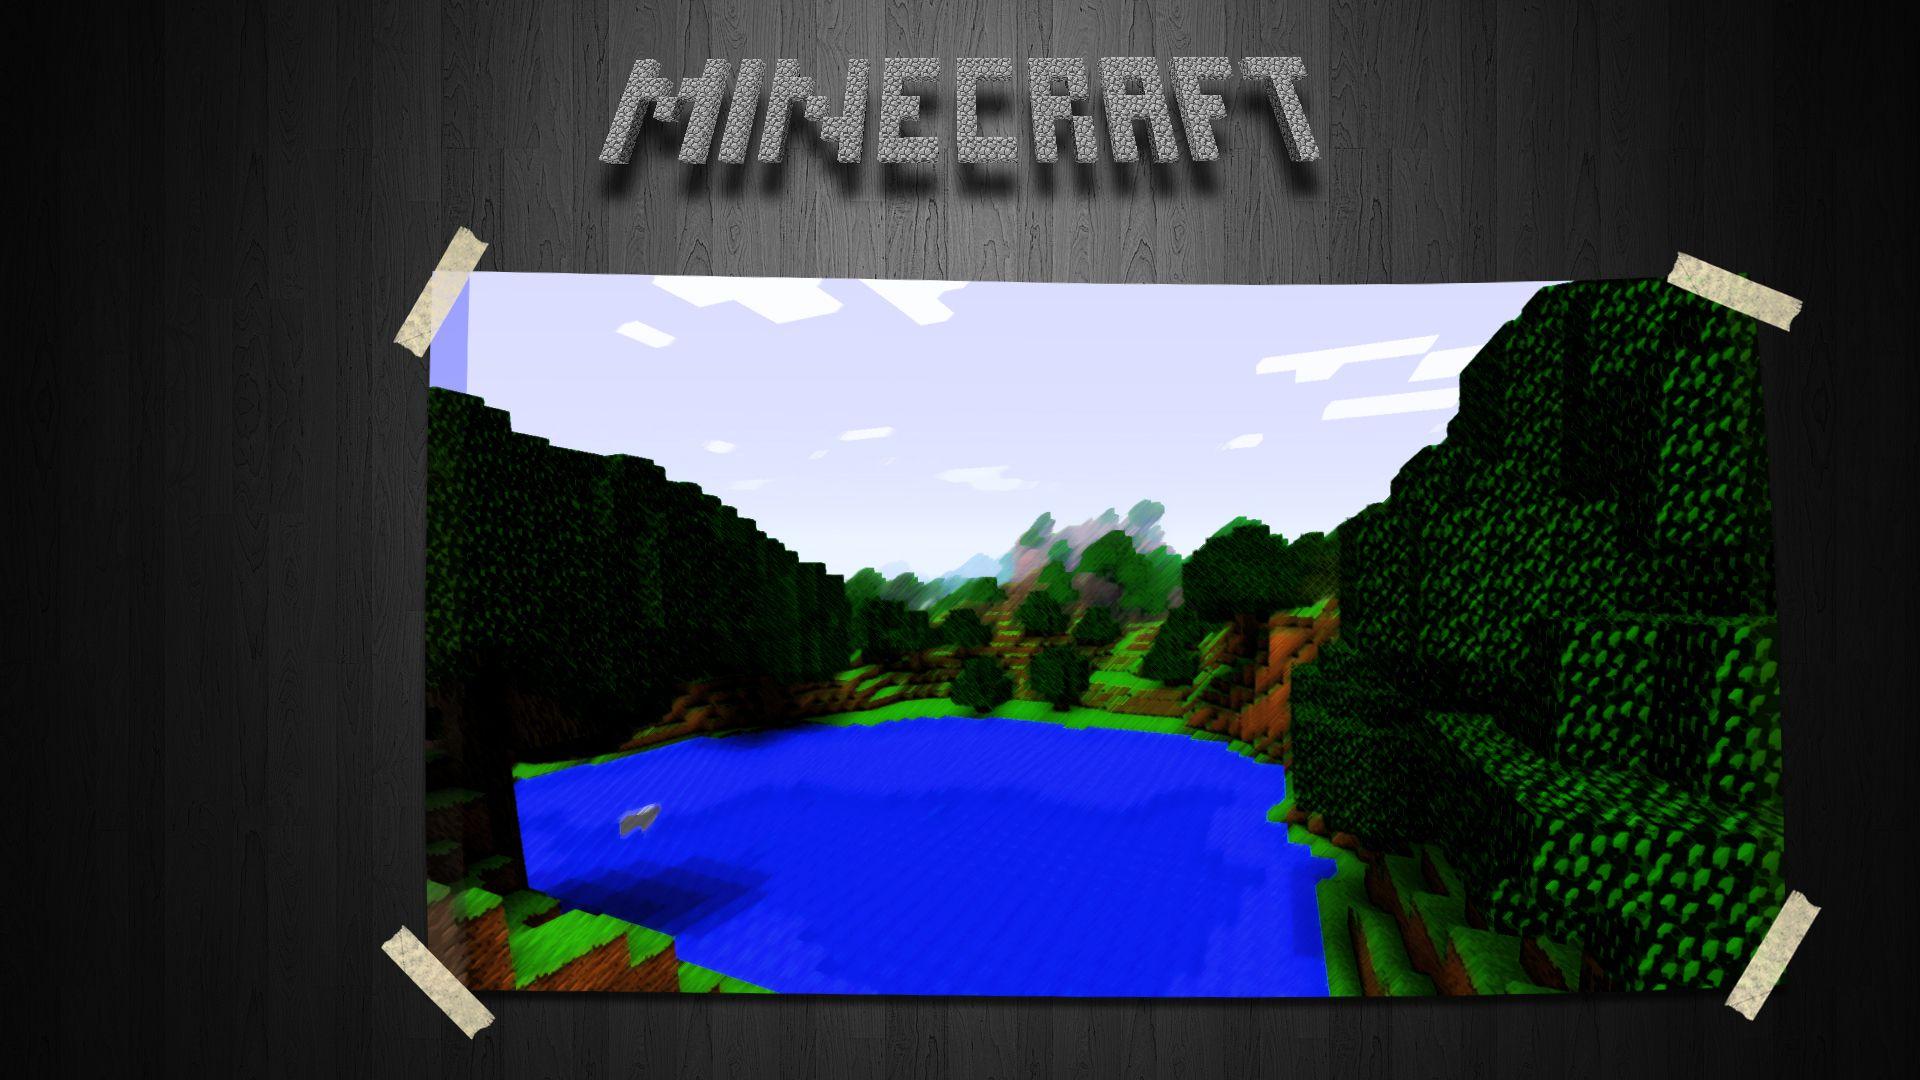 minecraft wallpaper 1080p 93085